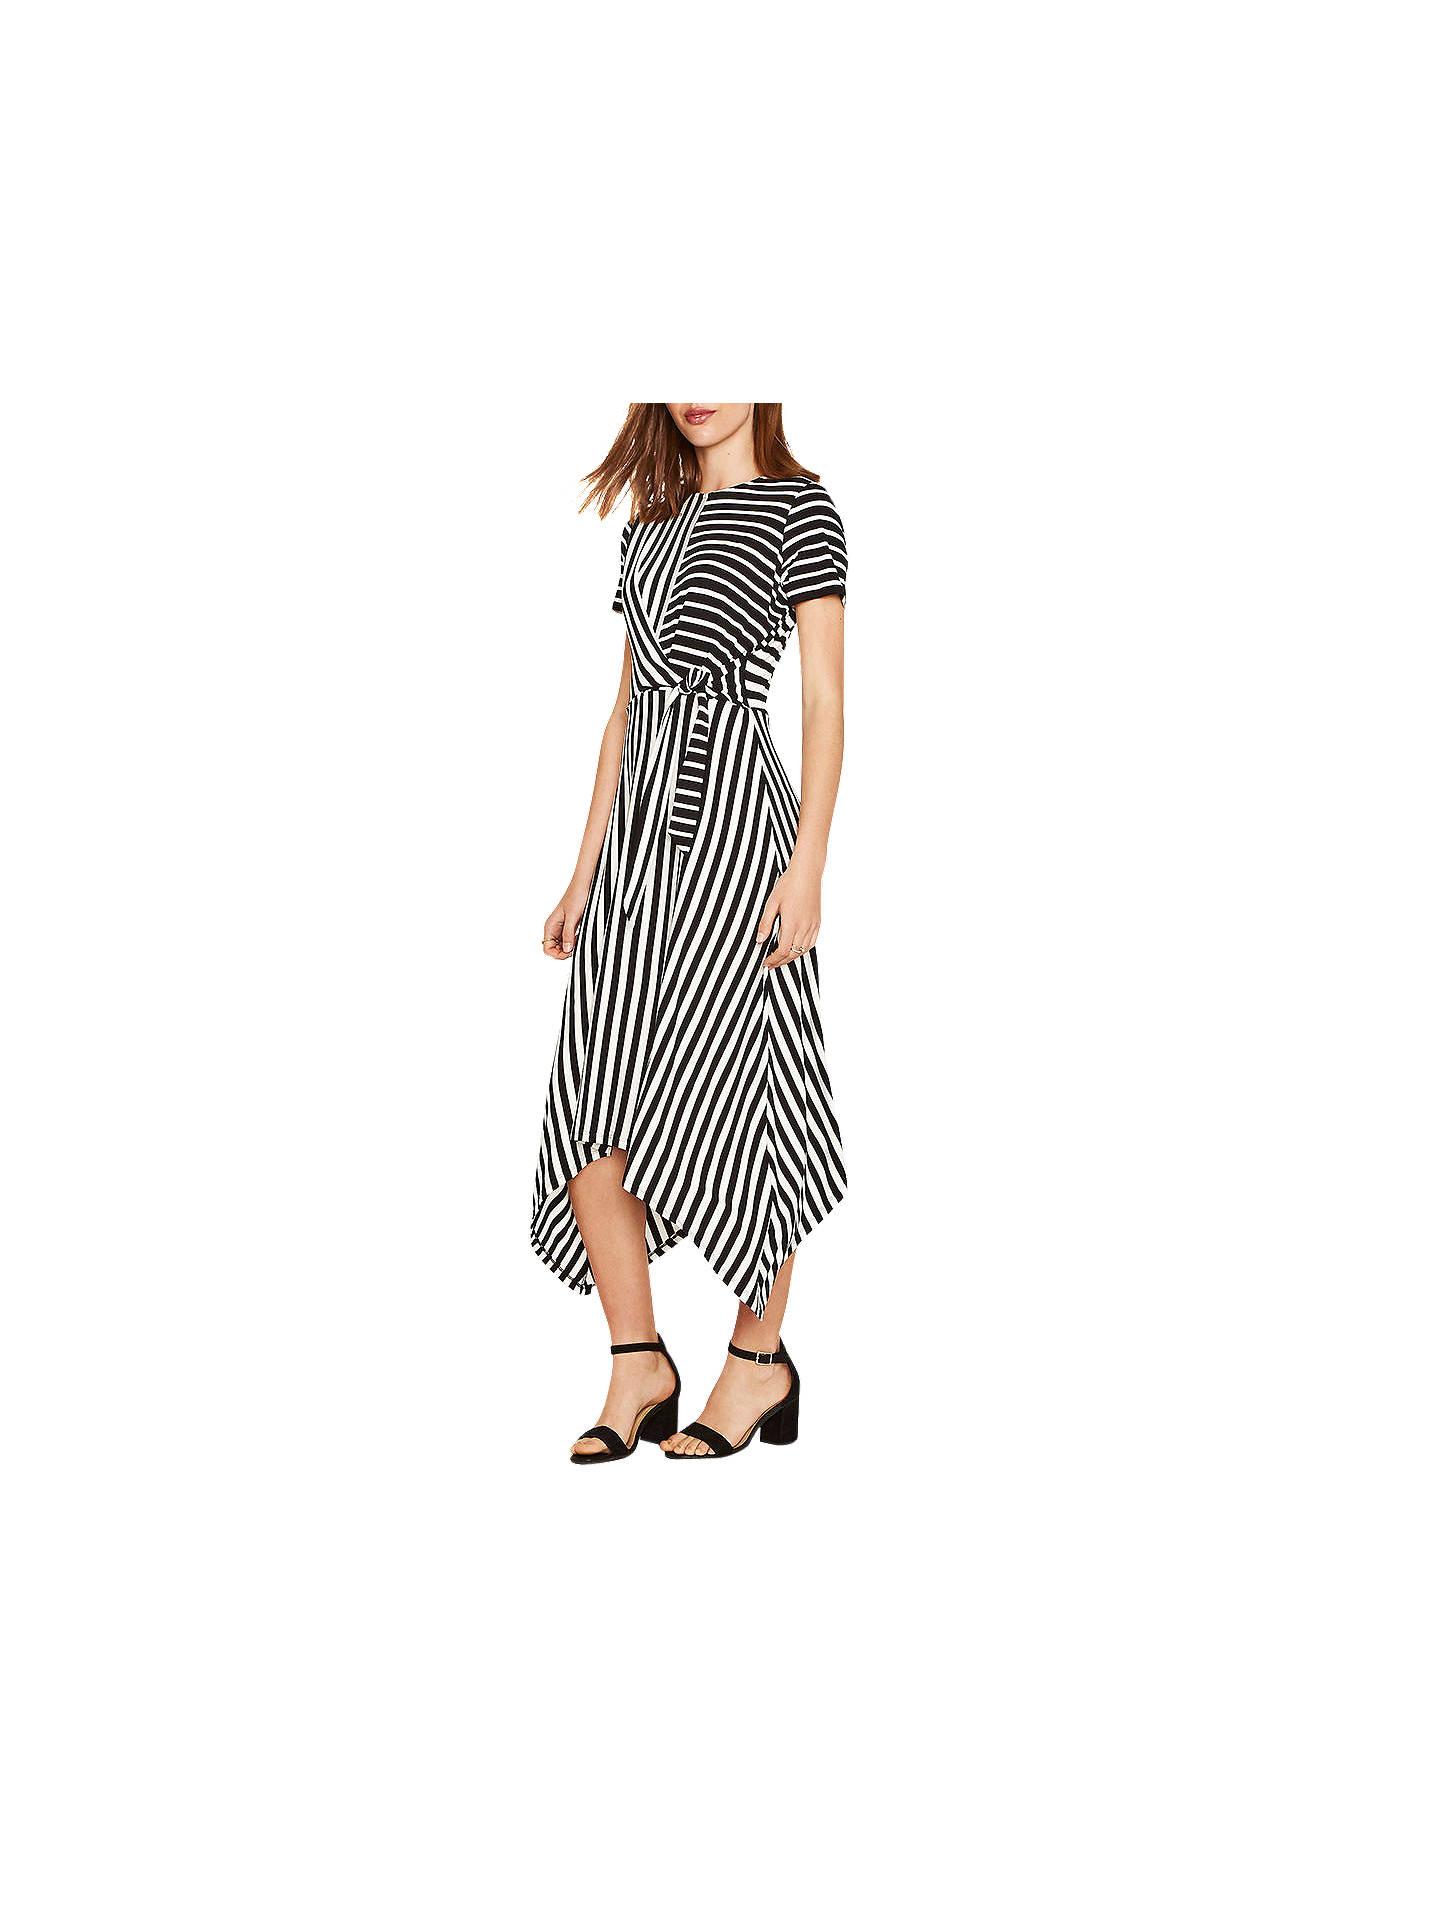 718cee37a495 Buy Oasis Asymmetric Striped Dress, Black/White, XS Online at johnlewis.com  ...